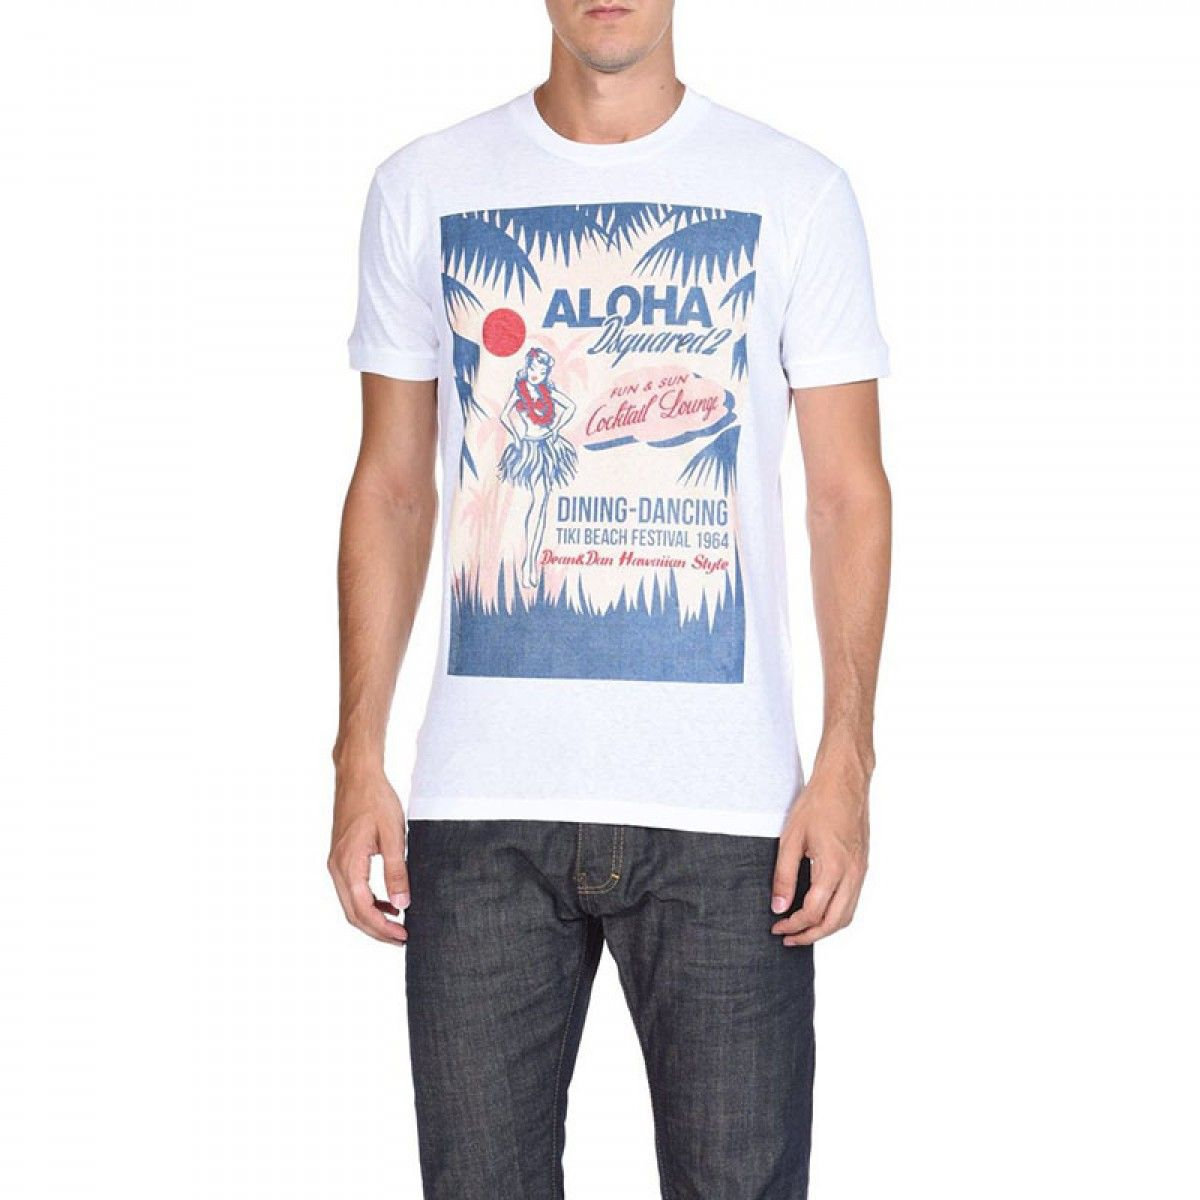 Dsquared2 SS2018 Mens T-Shirt DT245 ALOHA White